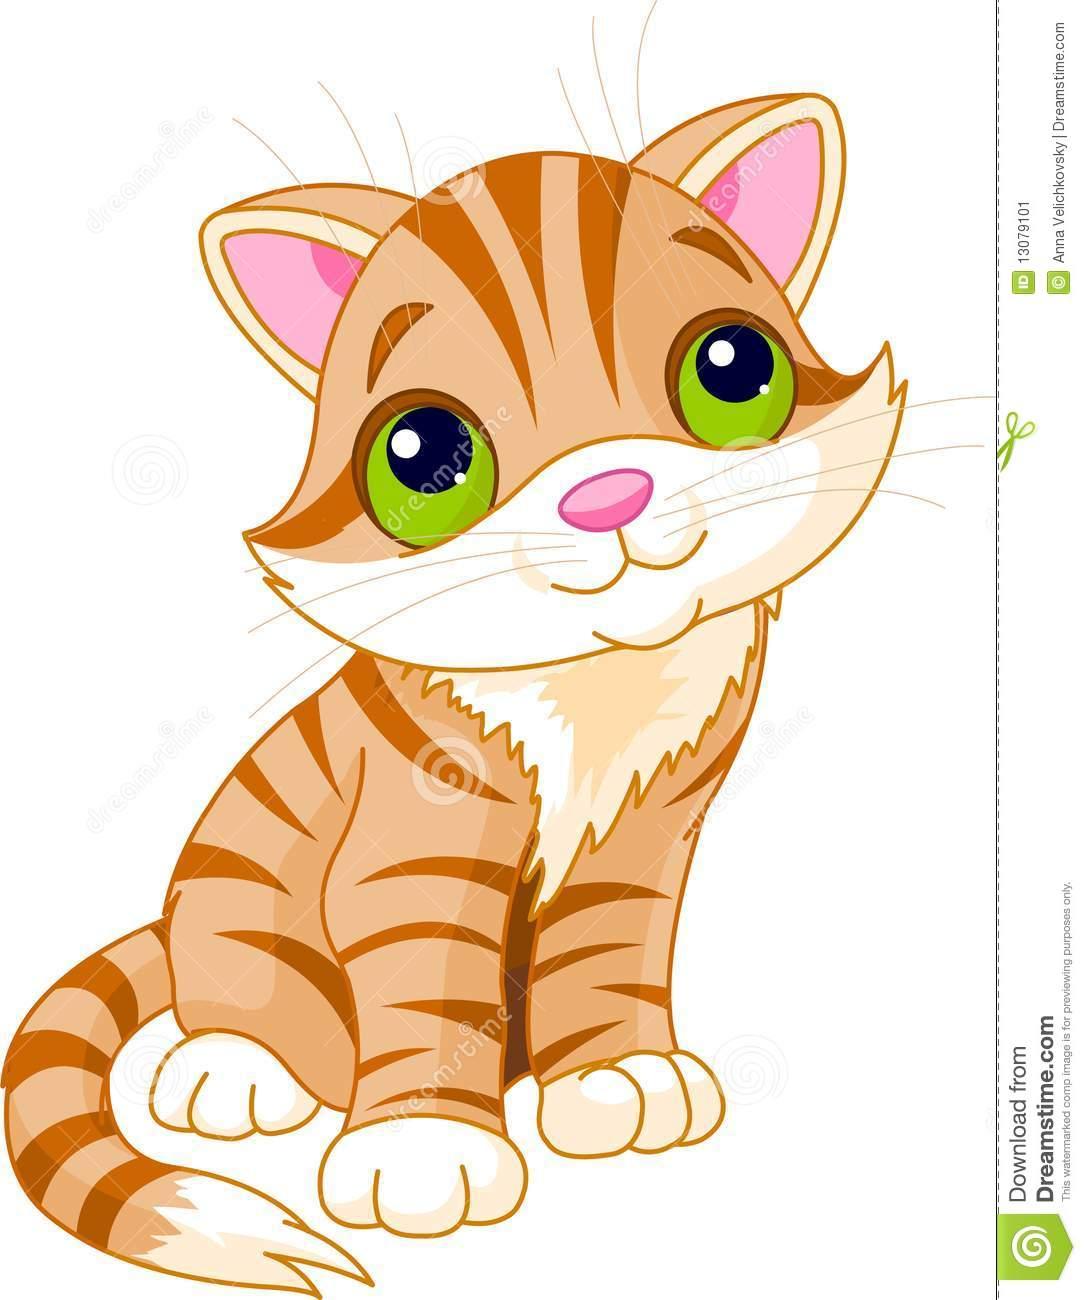 http://thumbs.dreamstime.com/z/very-cute-kitten-13079101.jpg